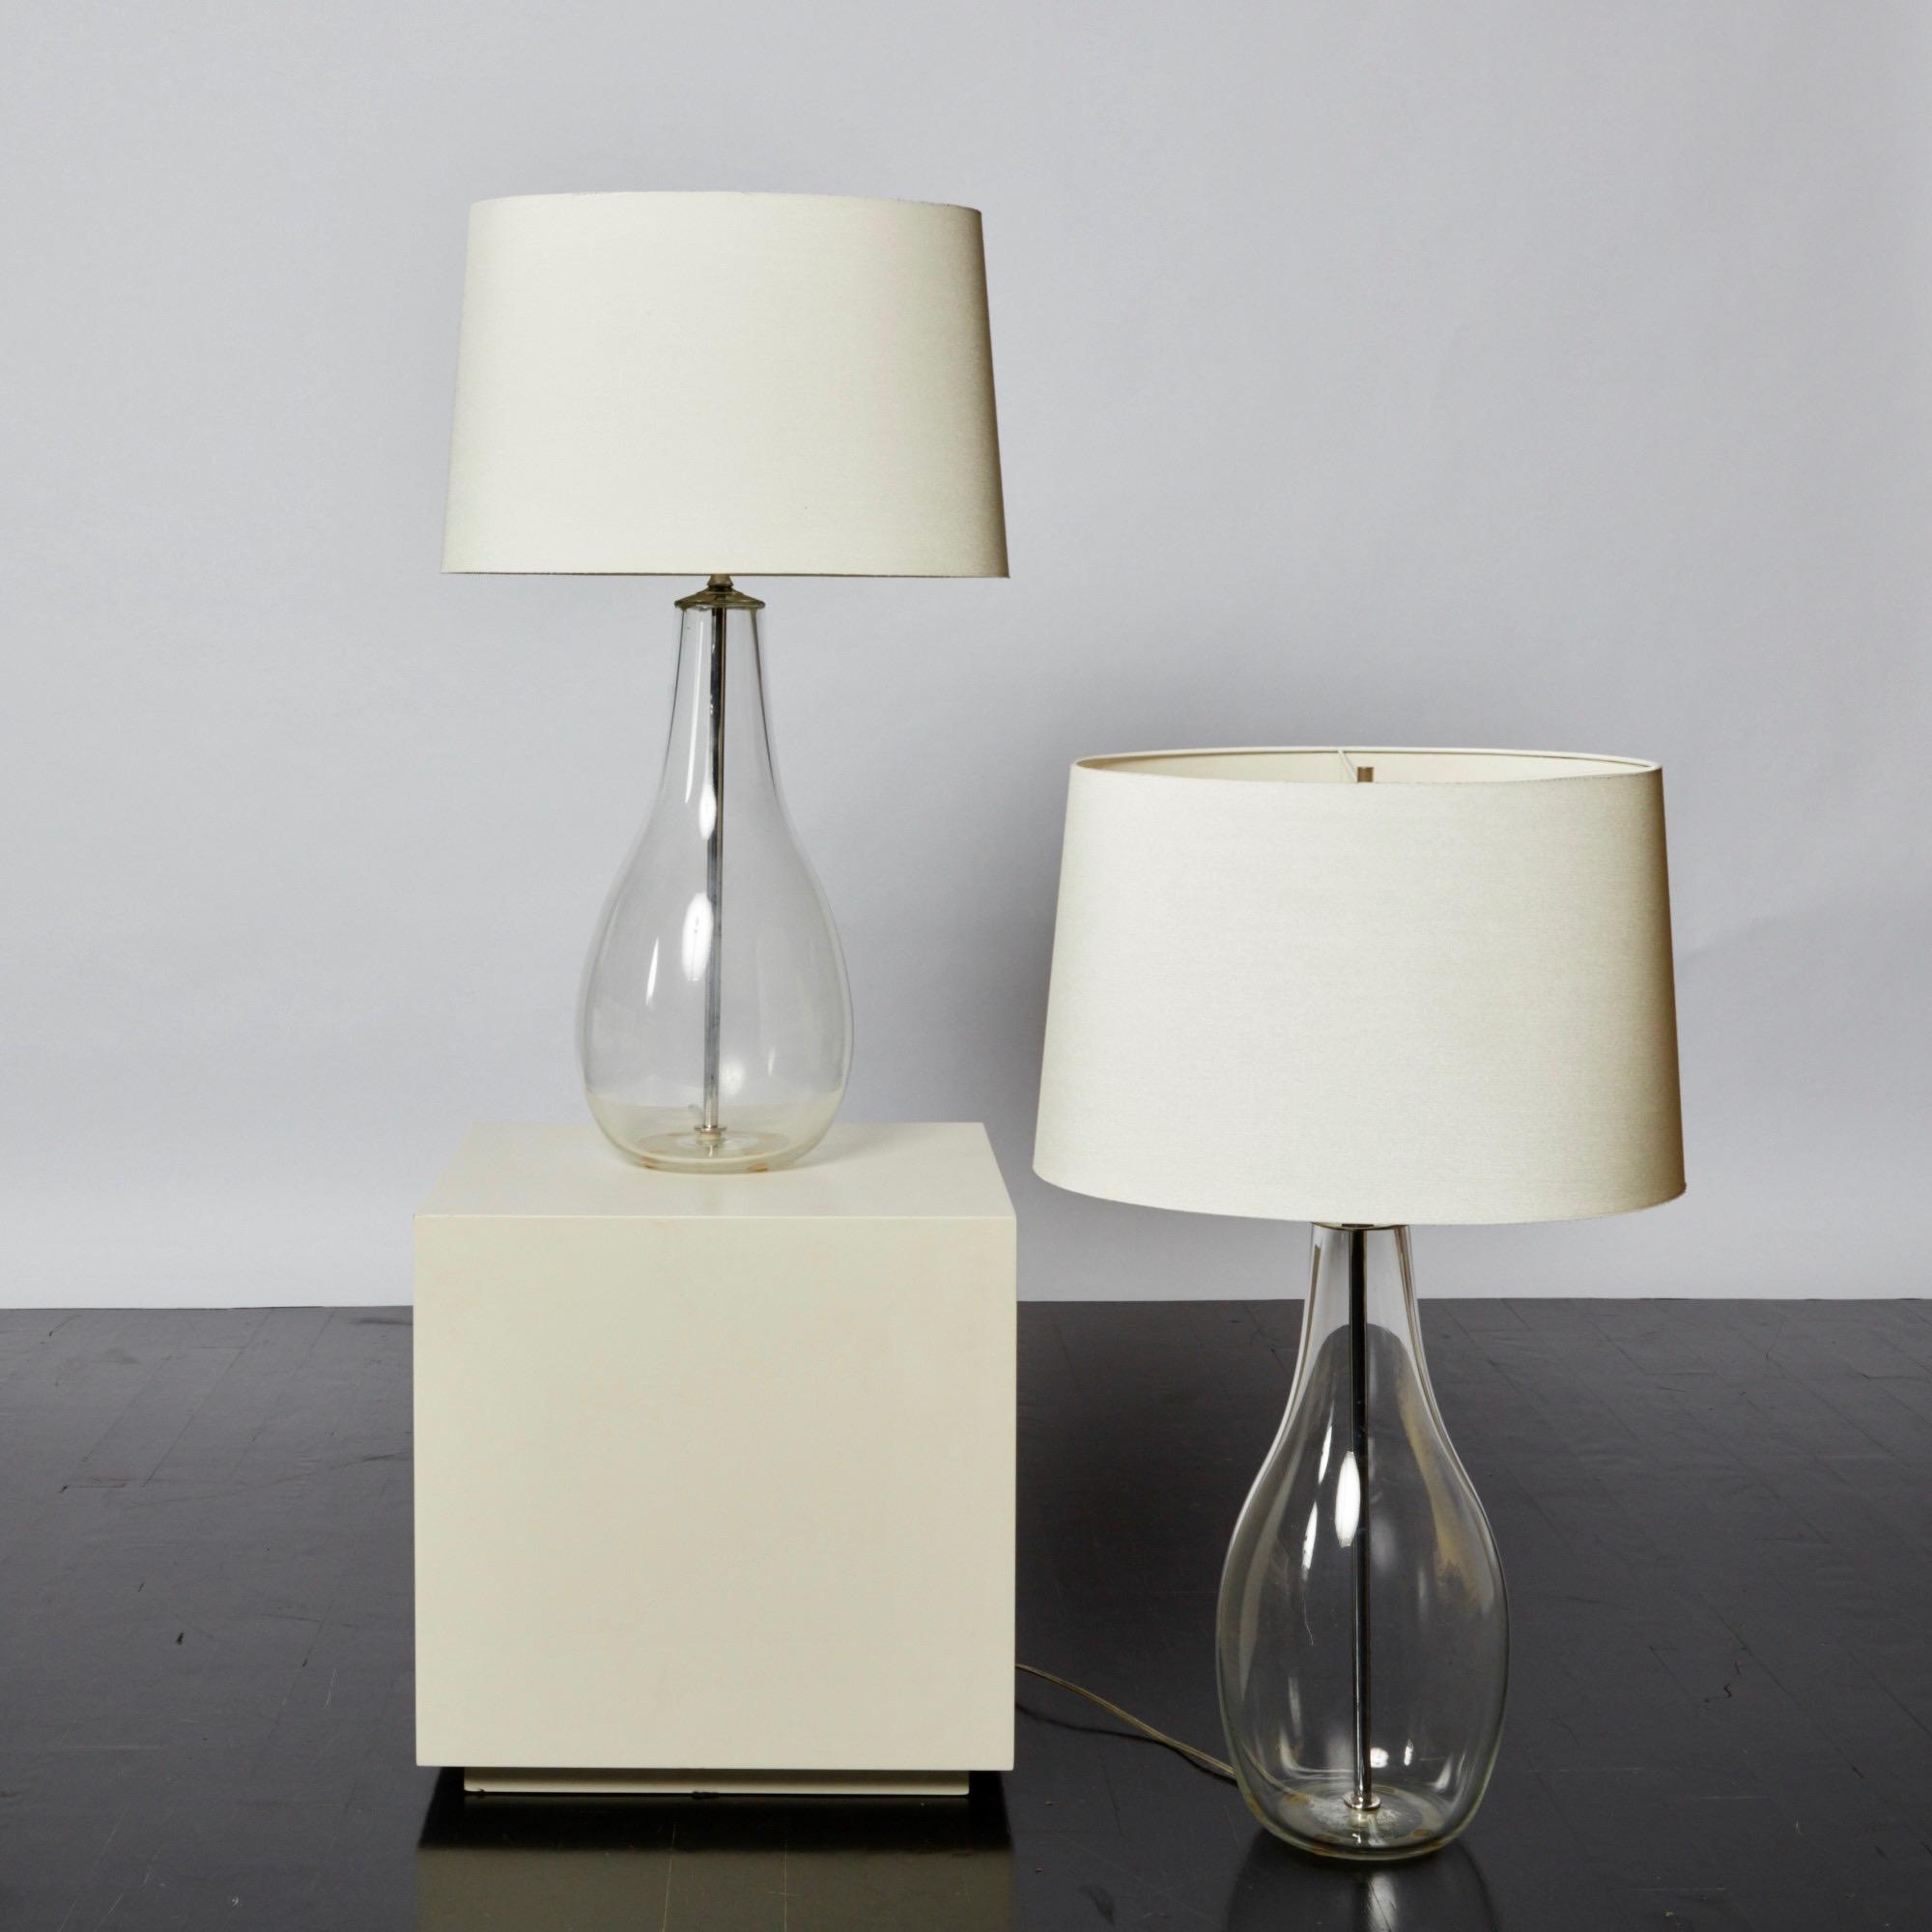 antony_todd_lamp_1.jpg